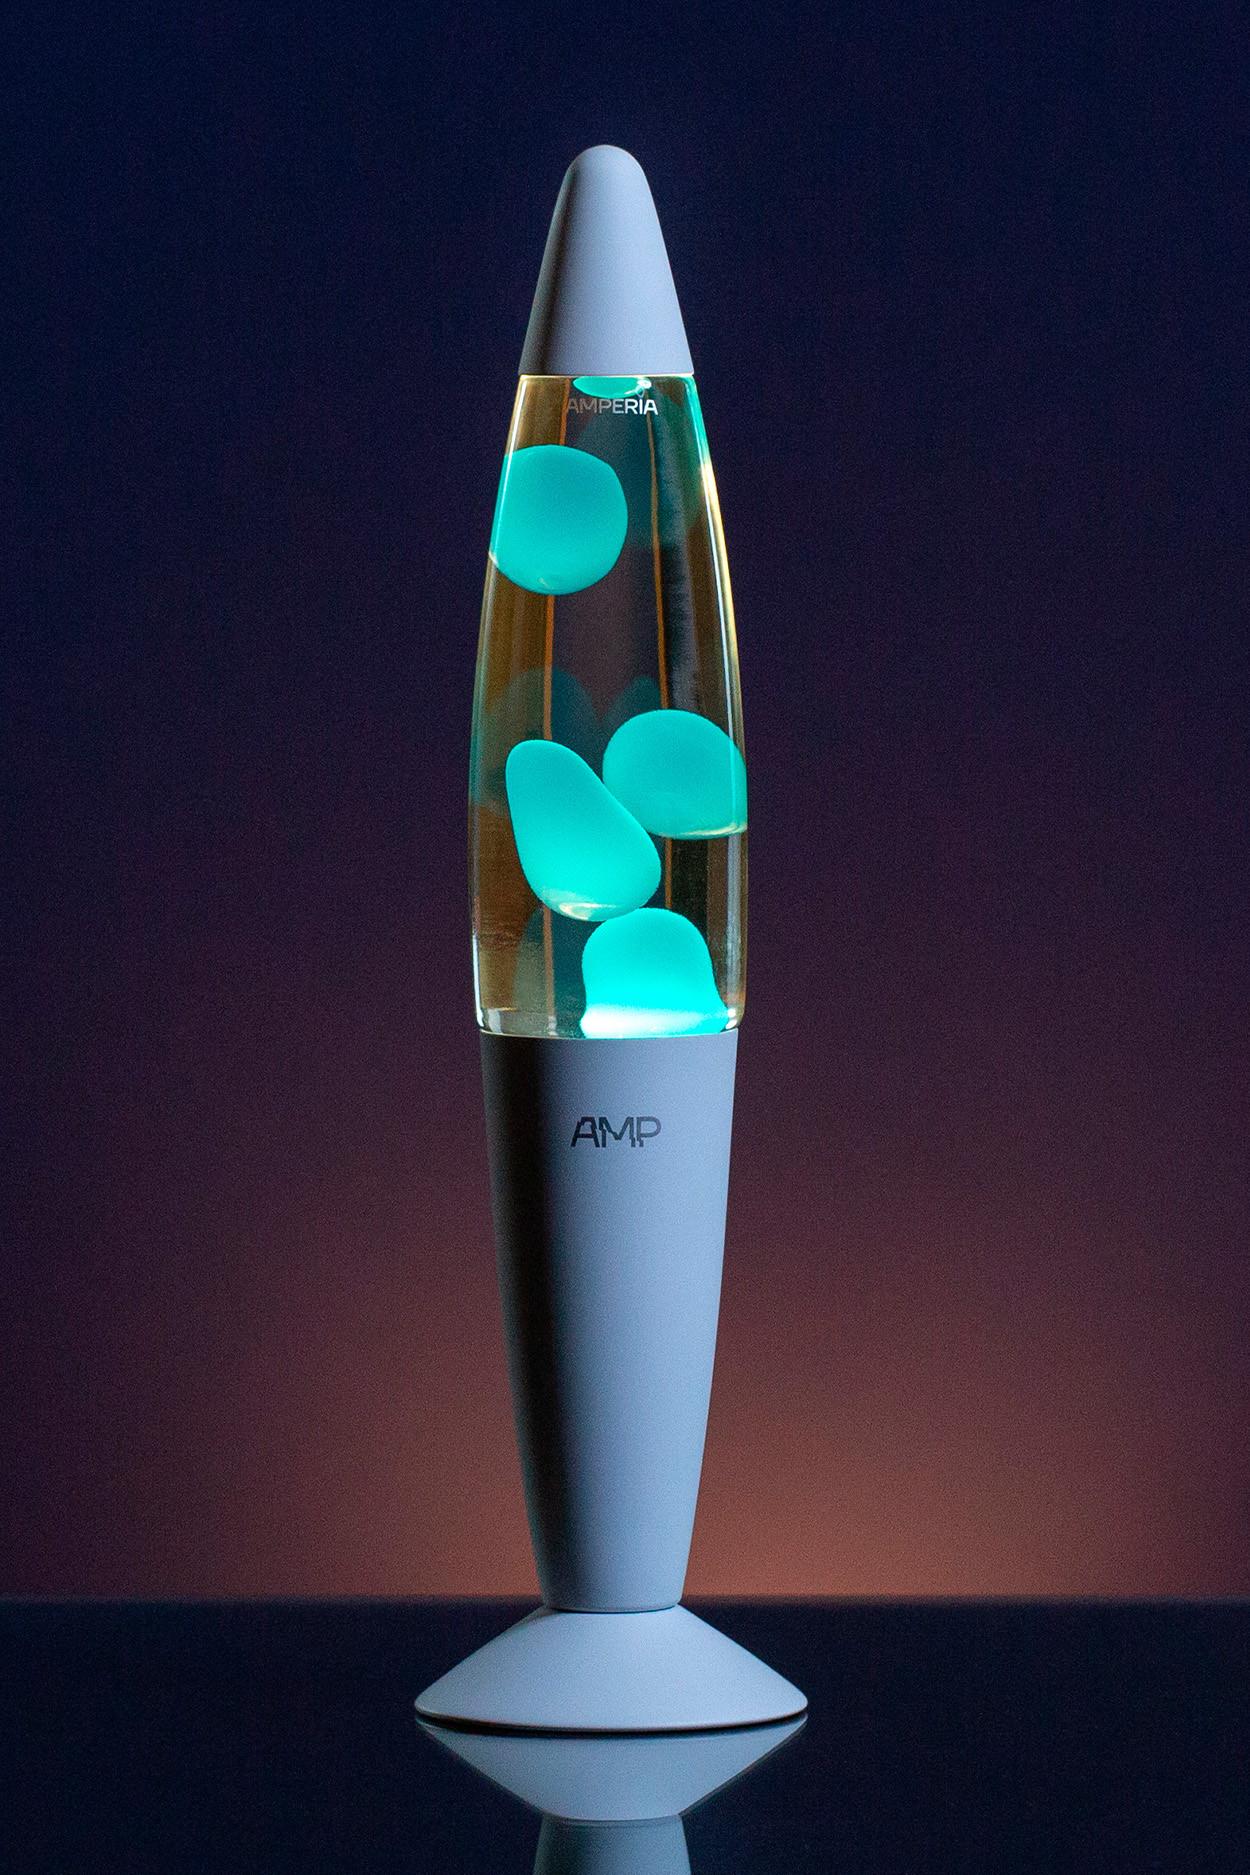 Лава лампа Amperia Rocket Бирюзовая/Прозрачная (35 см)